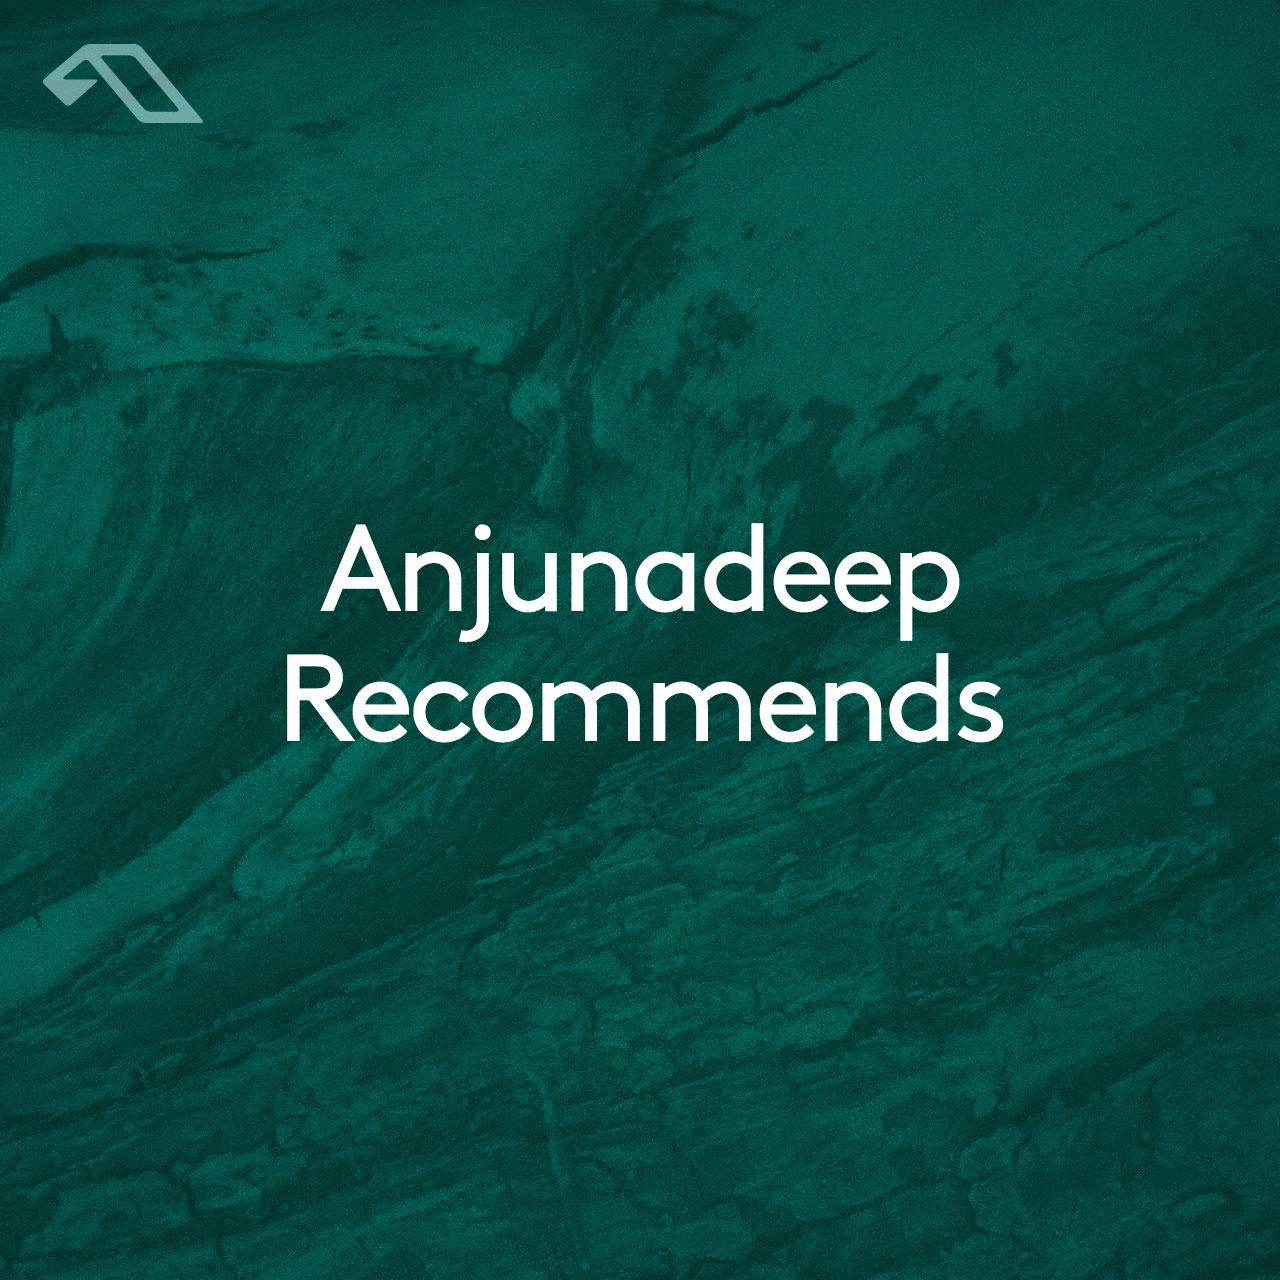 Anjunadeep New Releases